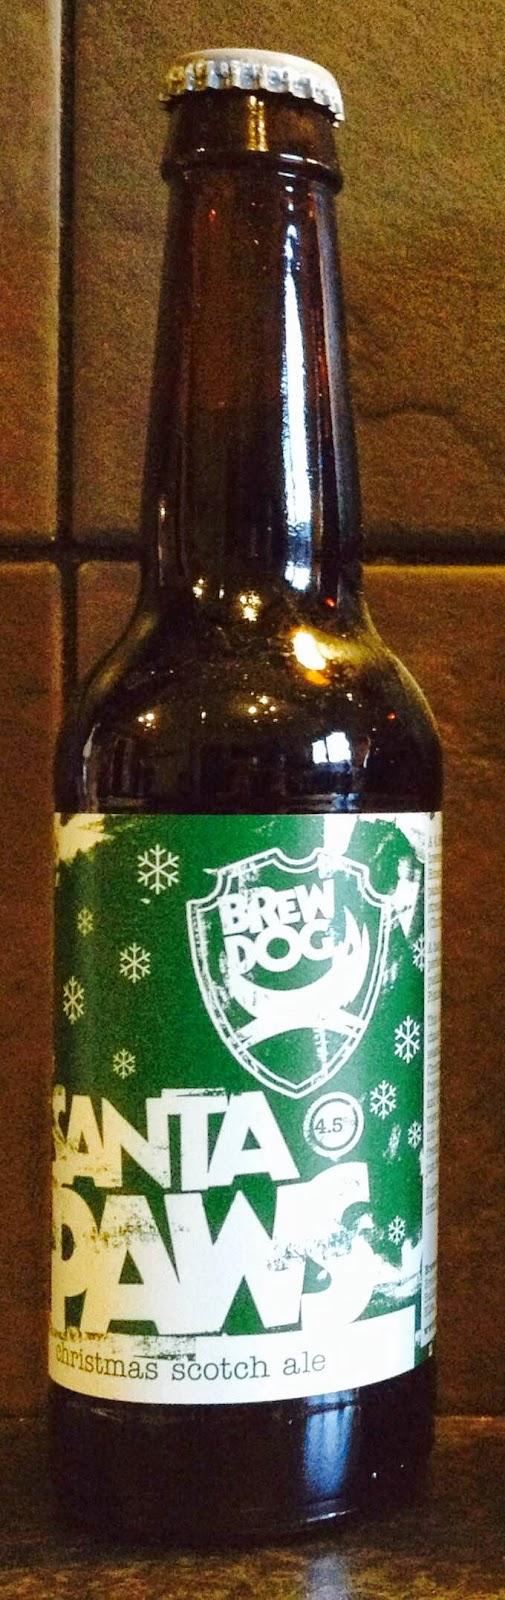 Santa Paws (Brew Dog)